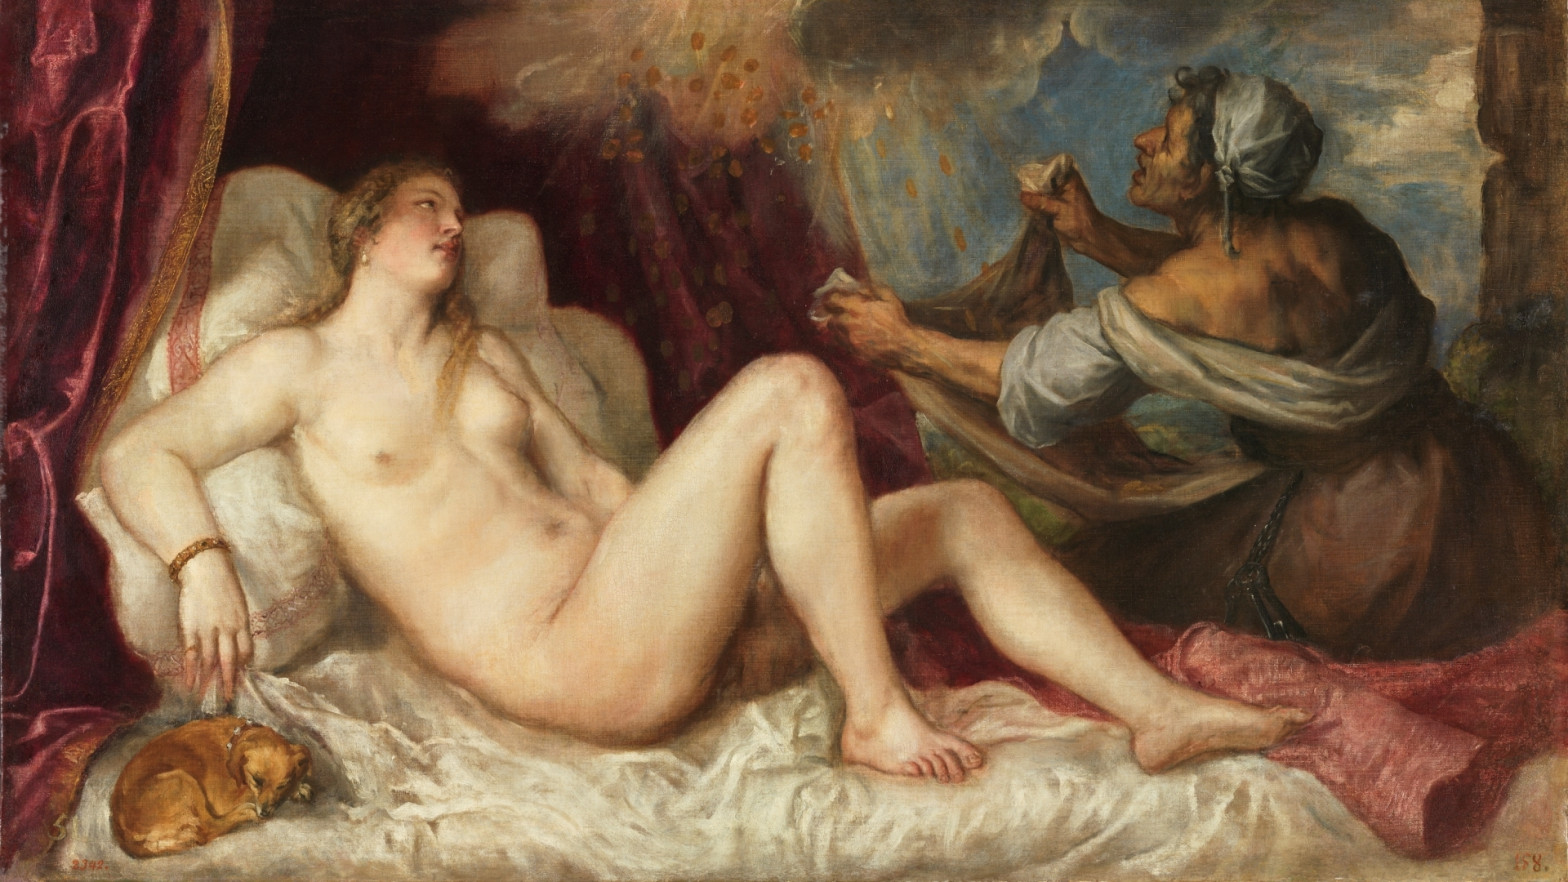 Así son las 'poesías' eróticas que Tiziano pintó para Felipe II